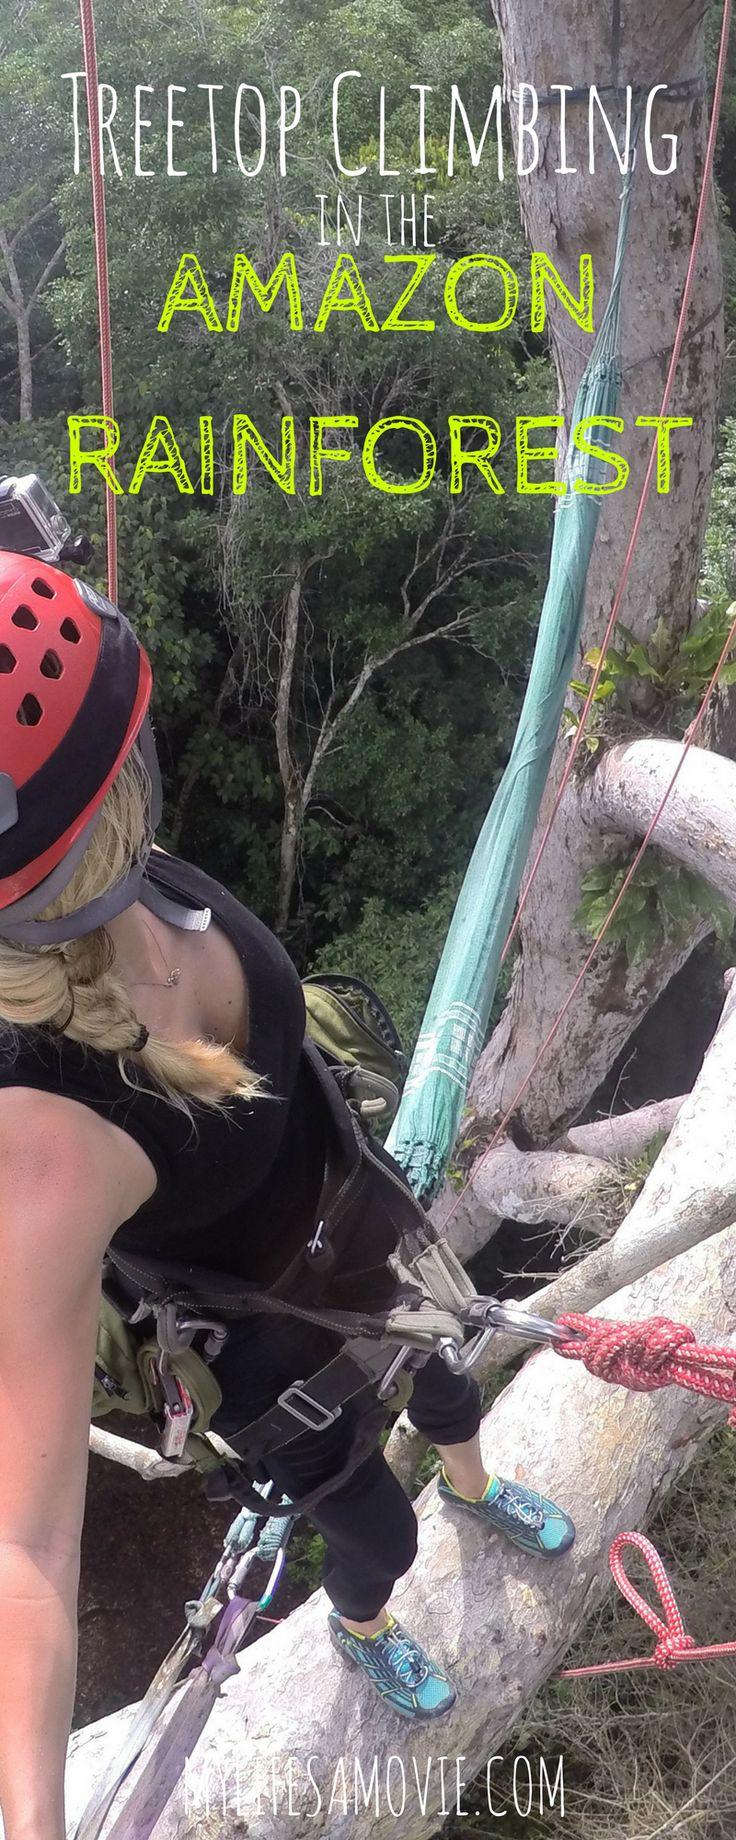 Explore the amazon jungle peru trip advisors - How To Go Treetop Climbing In The Amazon Rainforest